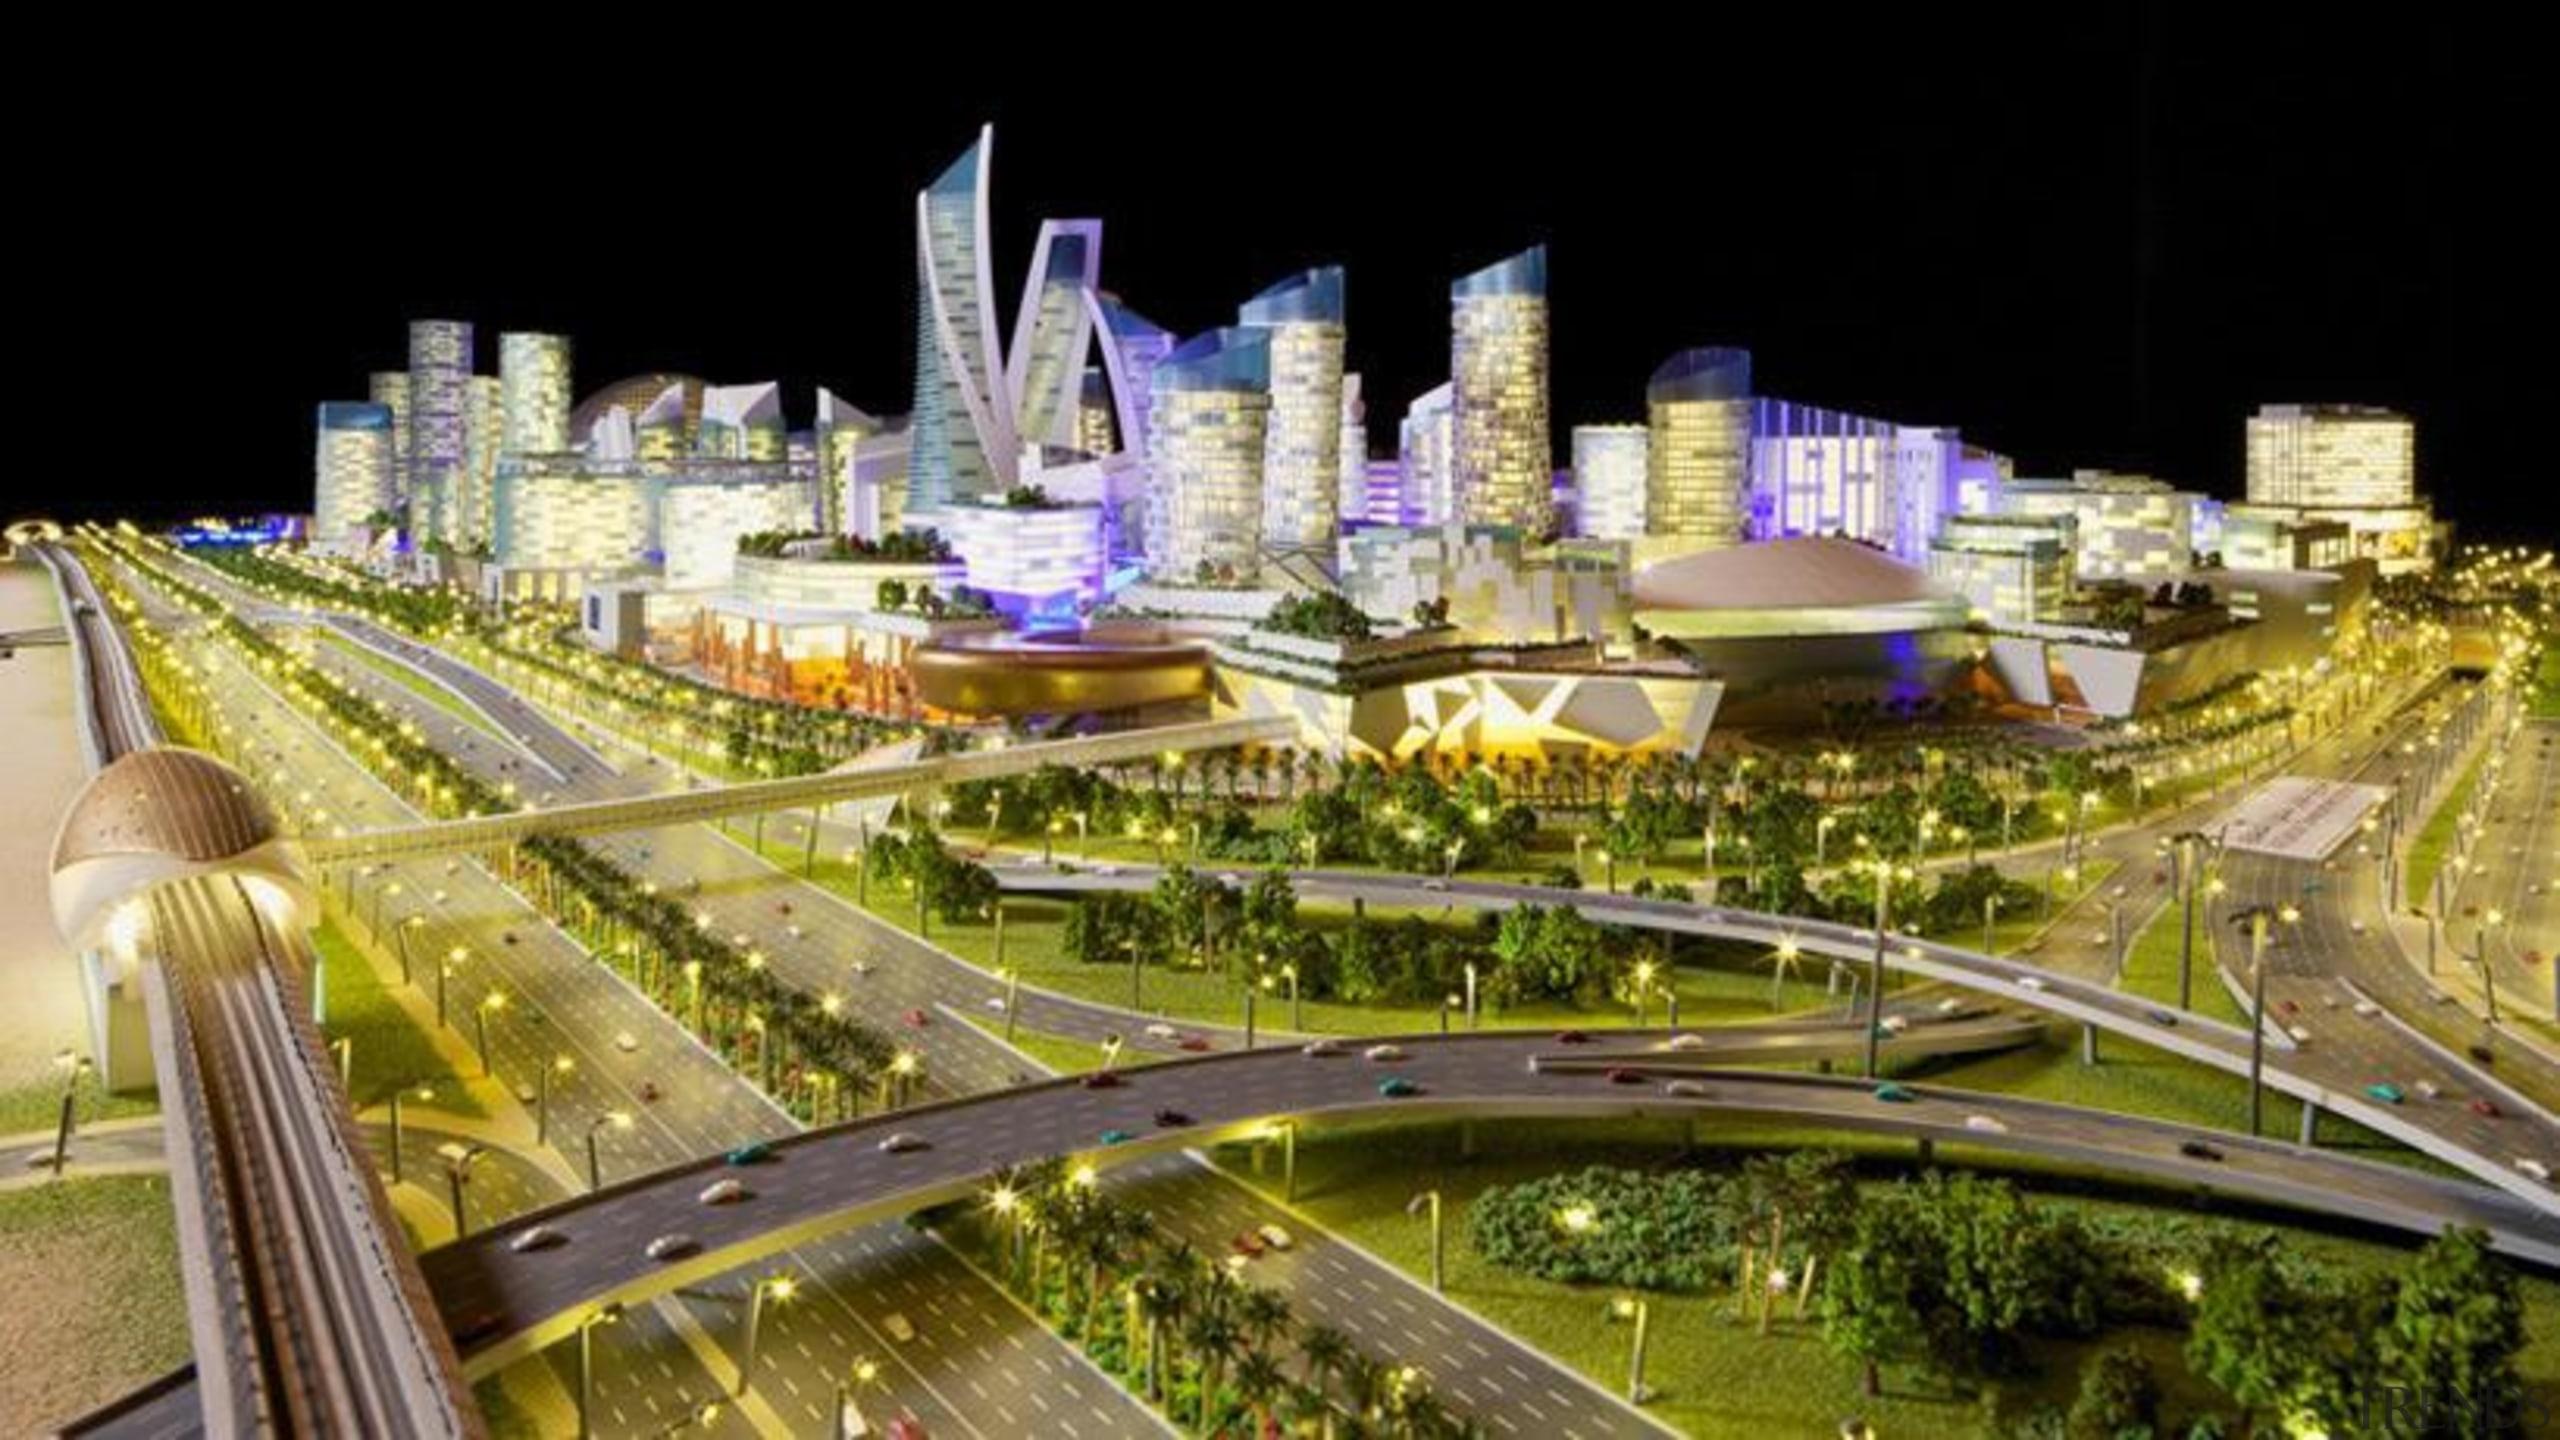 Although titled 'Mall of The World' this 48 bird's eye view, city, cityscape, downtown, landmark, metropolis, metropolitan area, mixed use, night, skyline, skyscraper, tourist attraction, urban area, urban design, brown, black